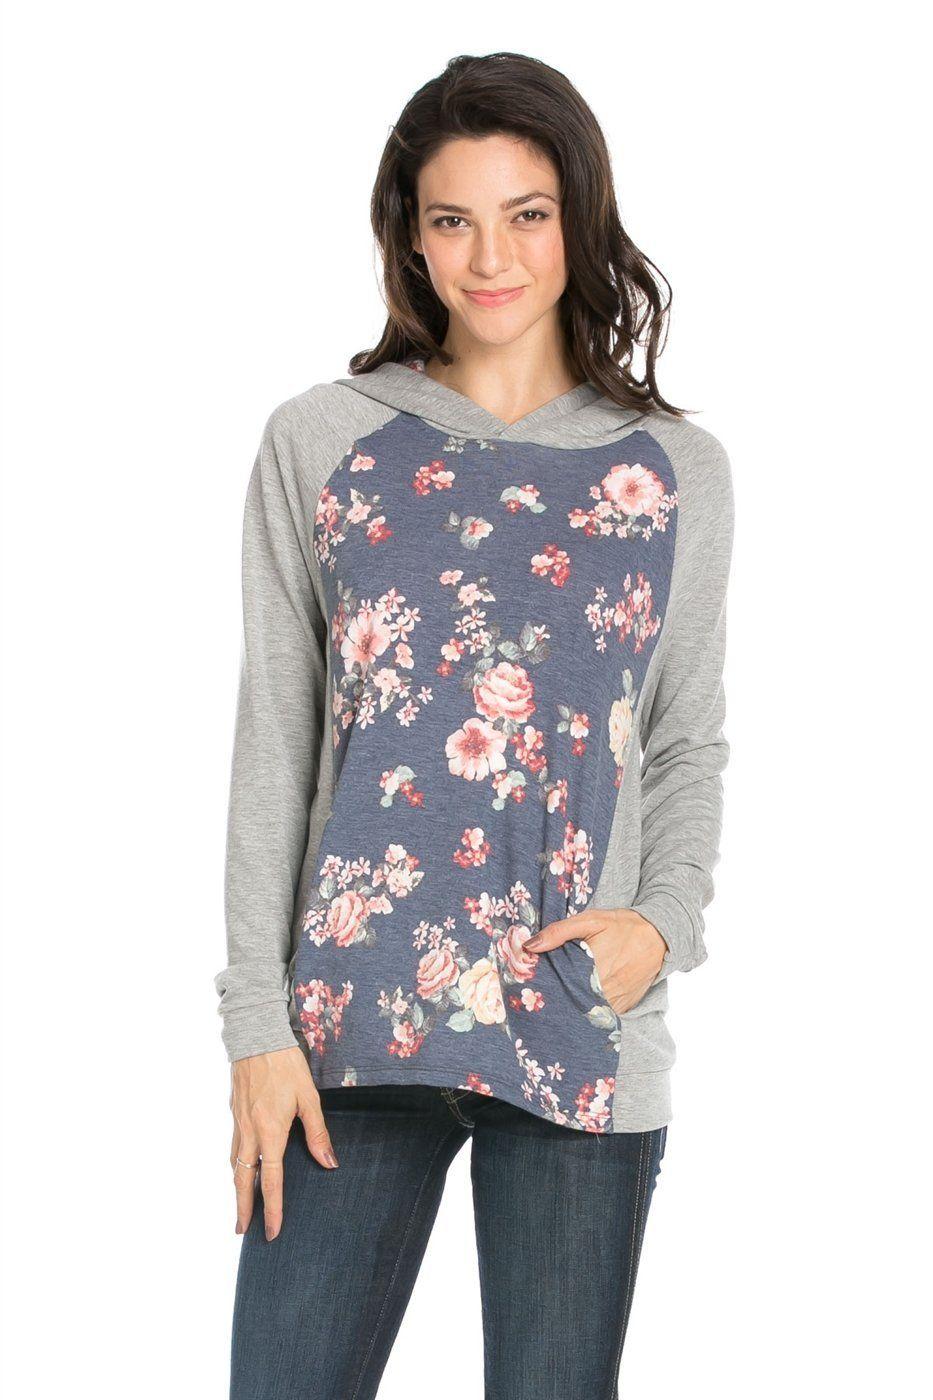 Burgundy floral gray hoodie products